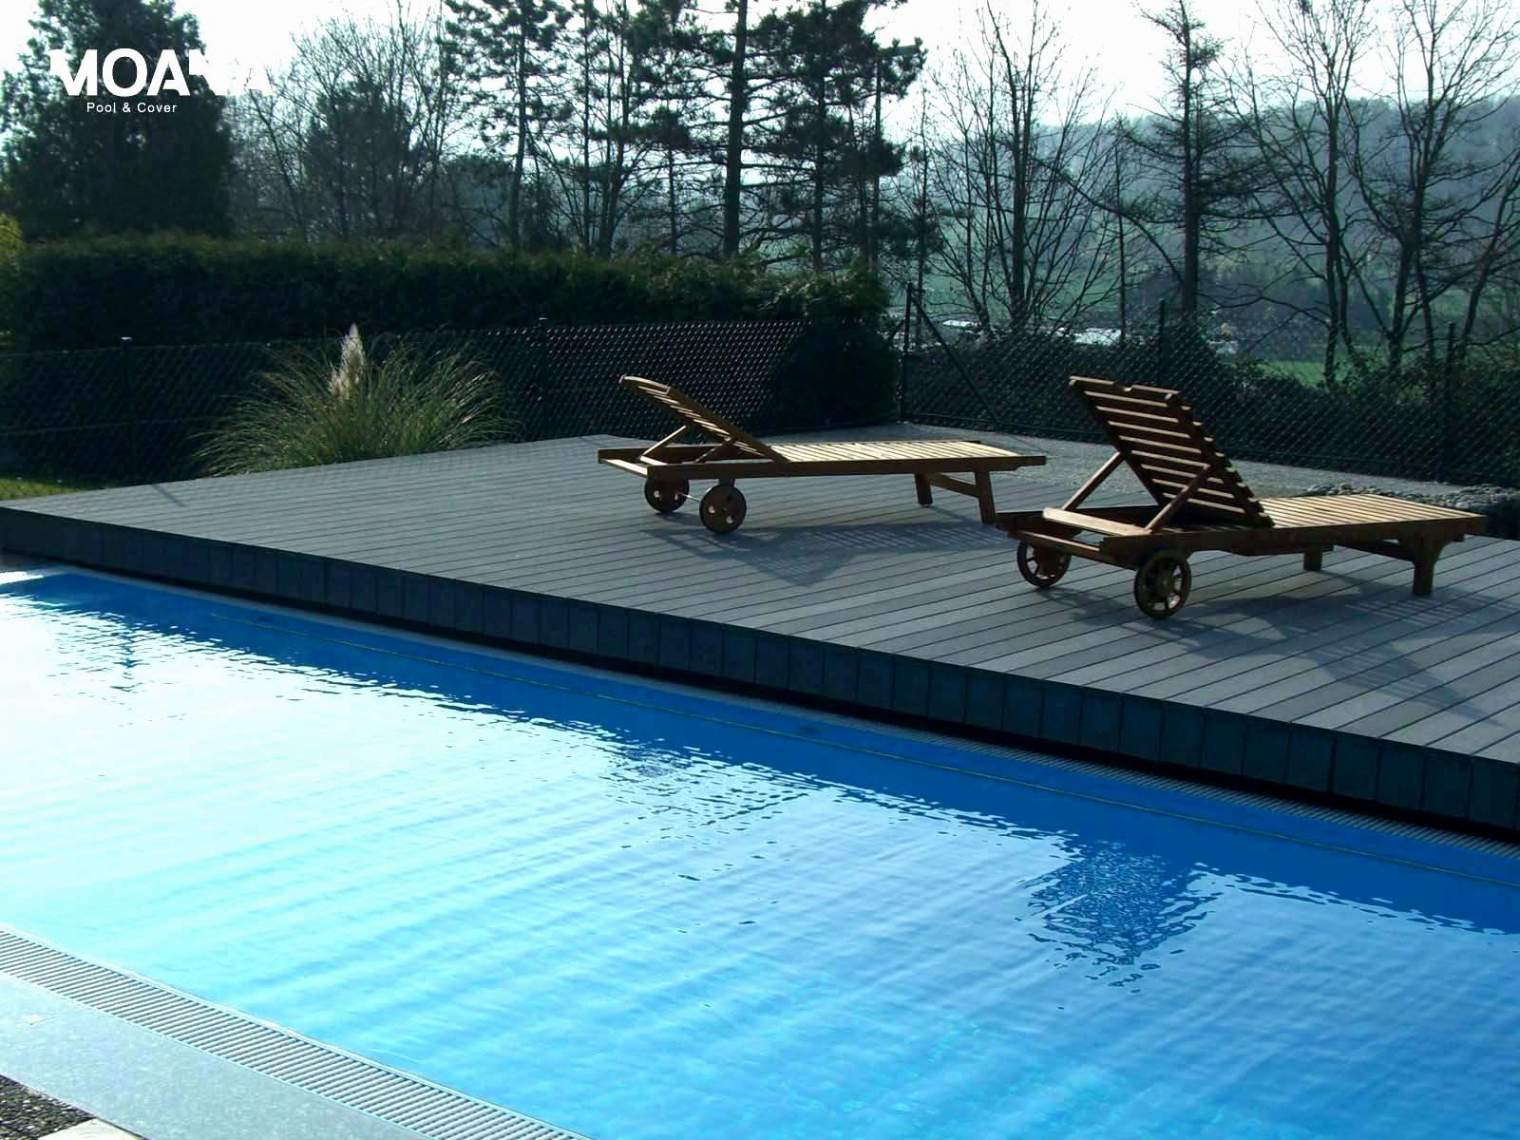 42 frisch pool bauen lassen bilder swimming pool leipzig swimming pool leipzig